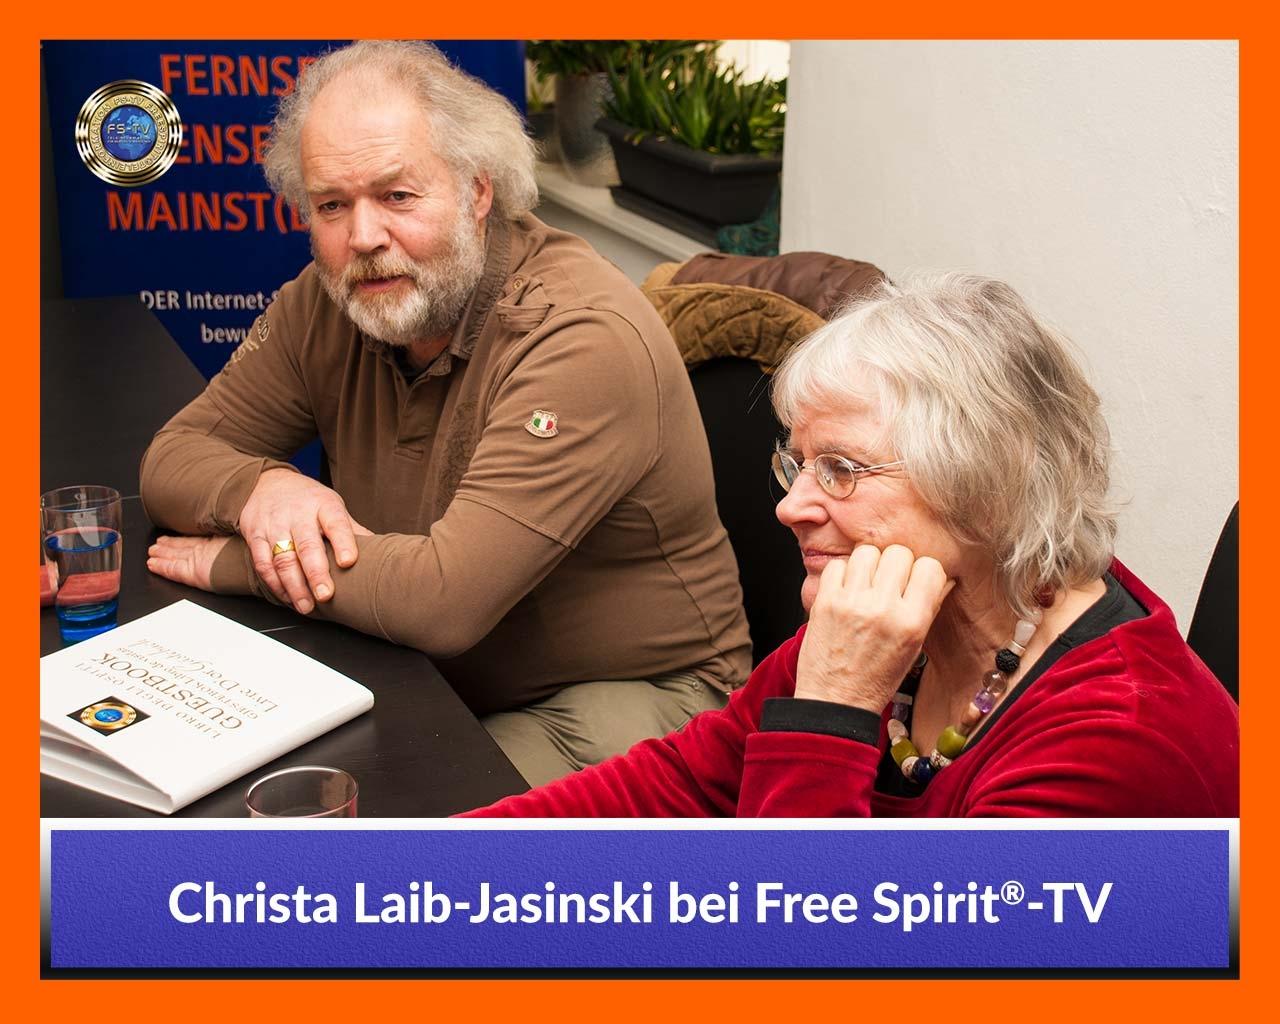 Christa-Laib-Jasinski-02